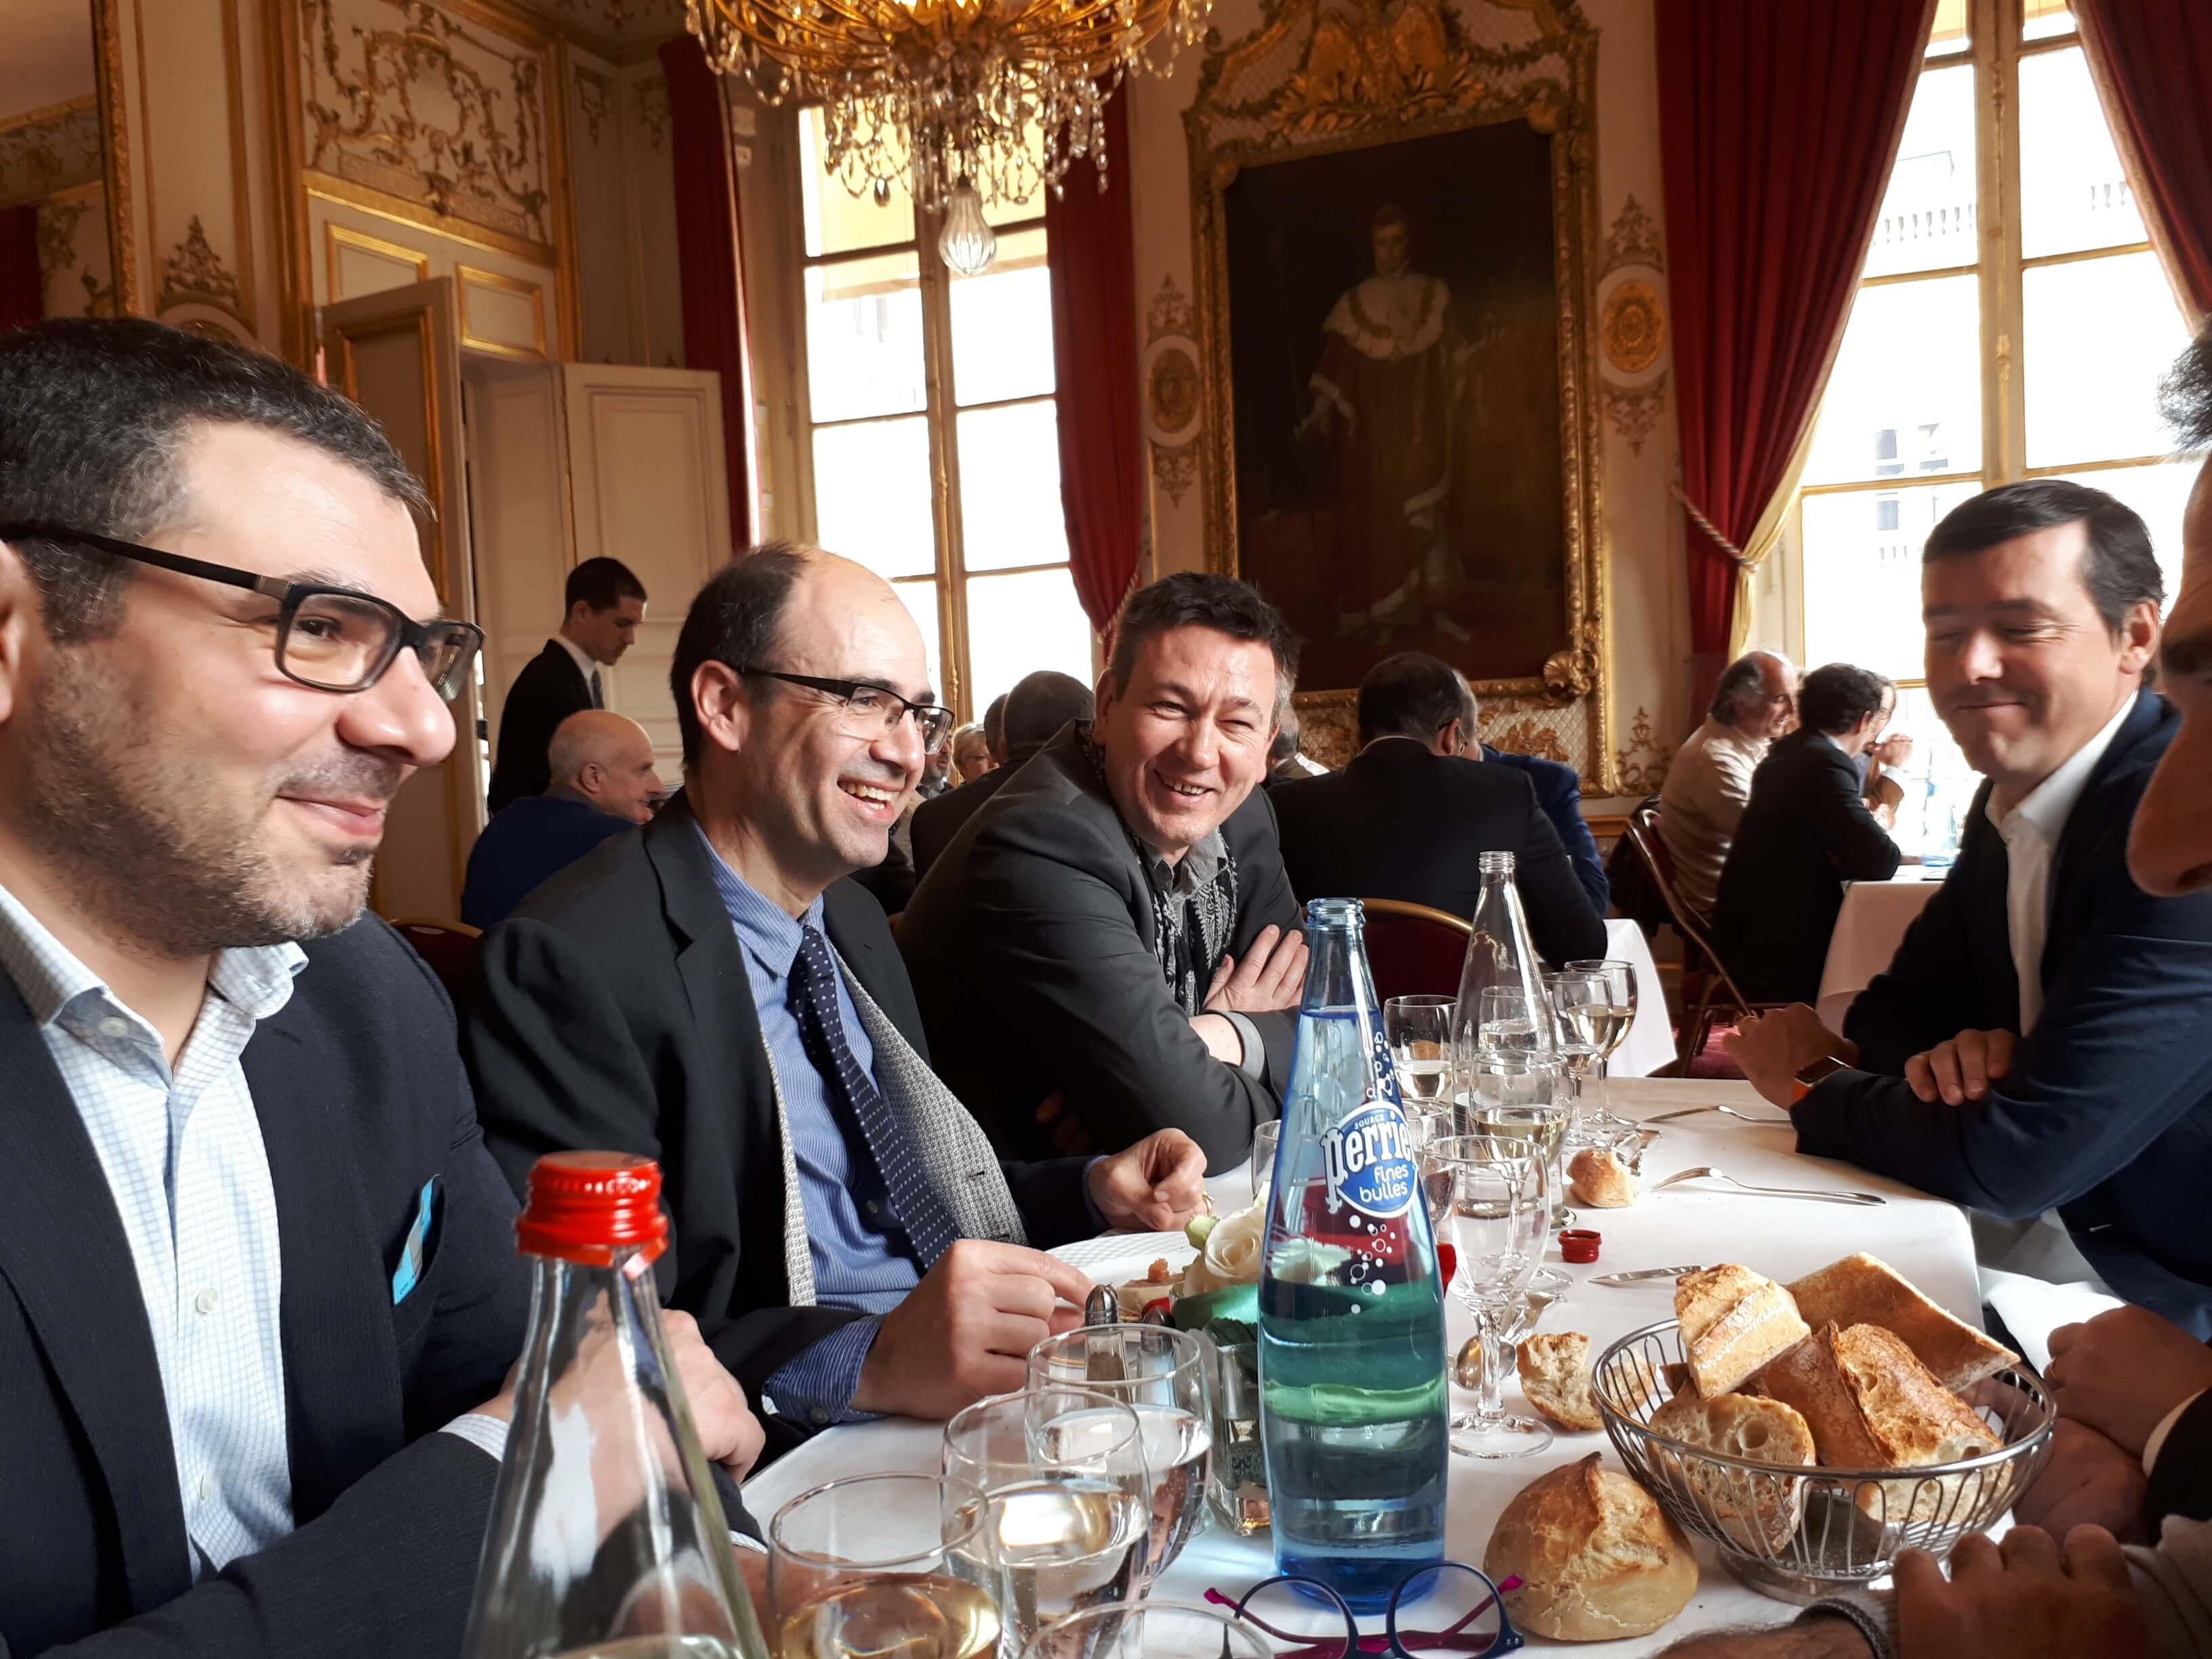 AG SYndicat des Cavistes Professionnels 2018 - MM Toulemonde (Comptoir des Vignes) - E Morgan (Nicolas) - F Naudot (Caves Franck Naudot) - R Mulliez (La Vignery - J Guilluy (La Vignery)